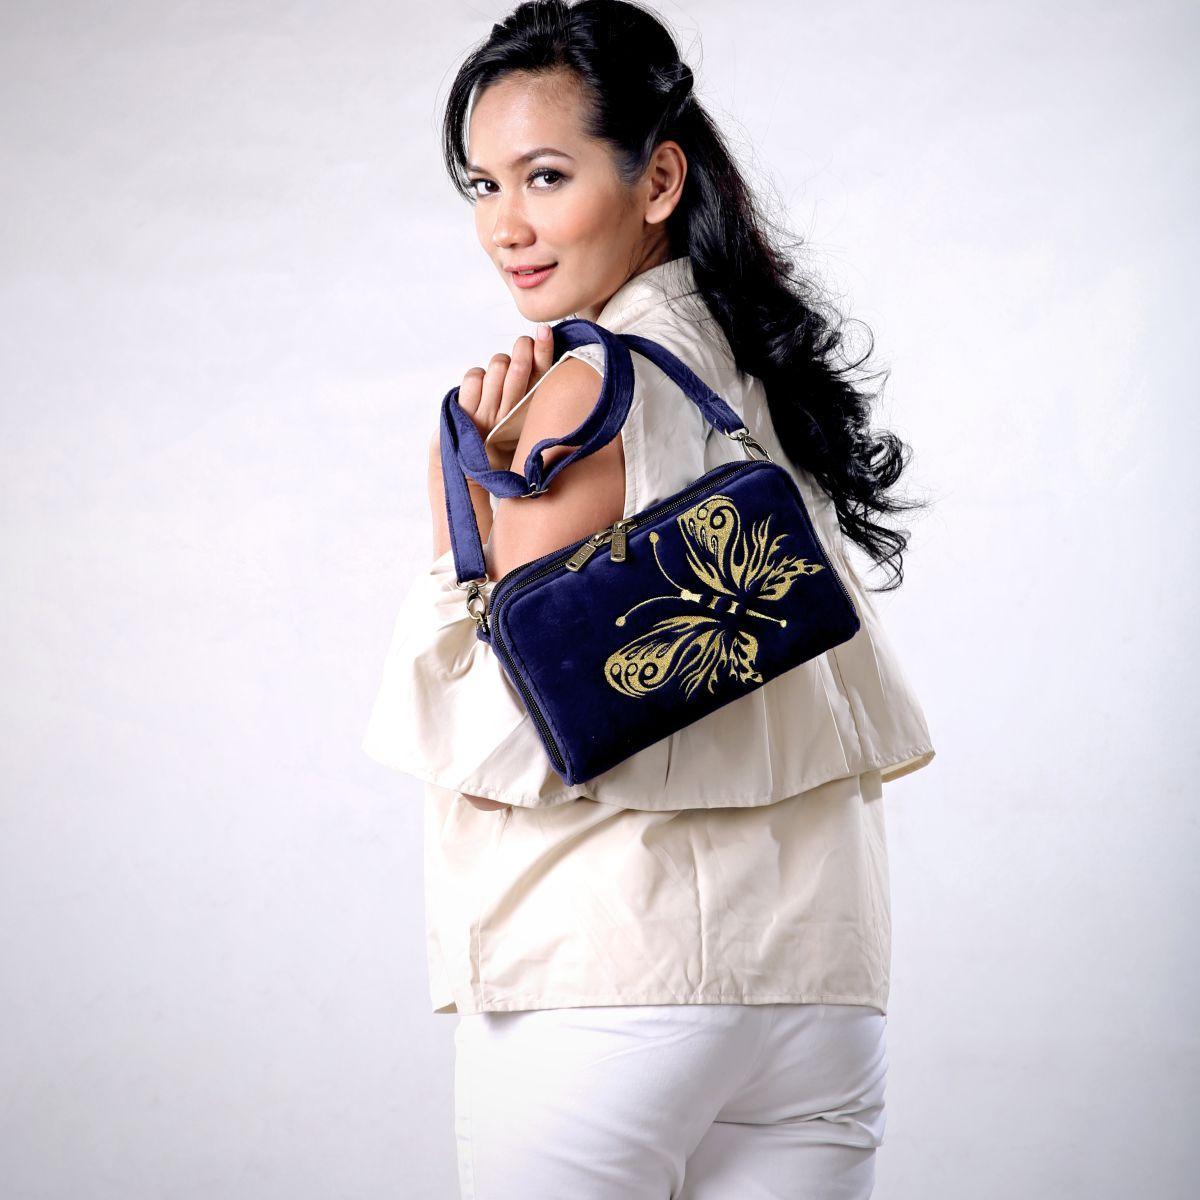 Sling Bag Original Branded Etnik, Dompet Wanita HPO 8 Anteroz